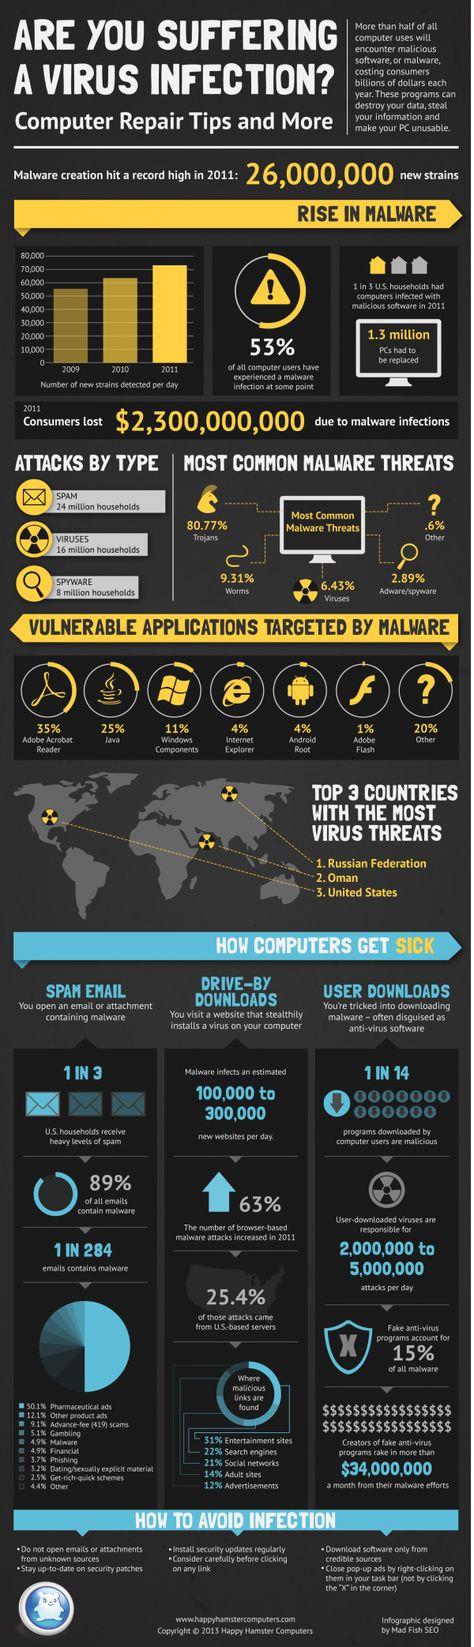 Virus Infection: Computer Repair Tips